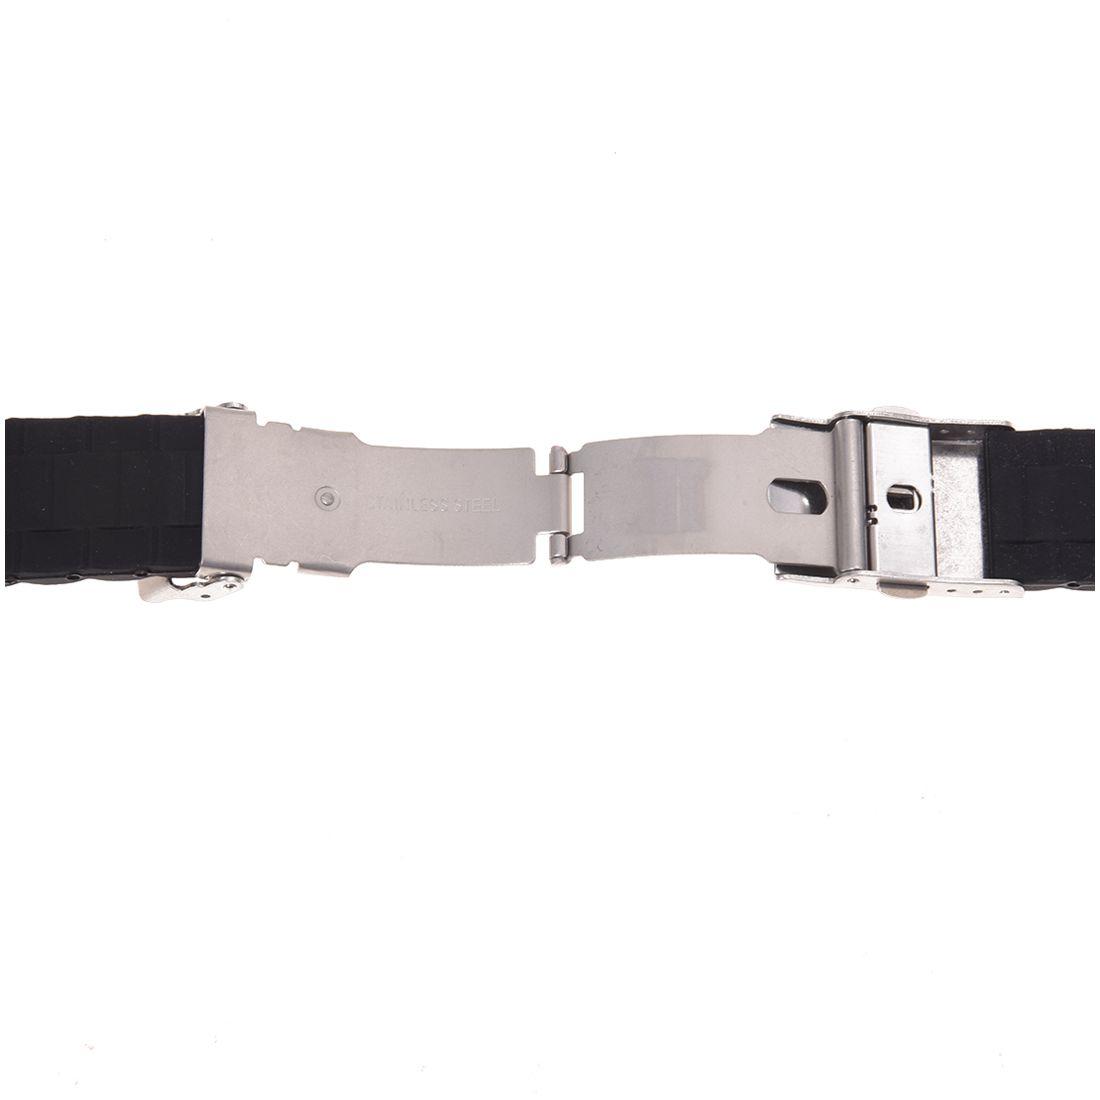 schwarze silikon armband wasserdicht tauchen band. Black Bedroom Furniture Sets. Home Design Ideas